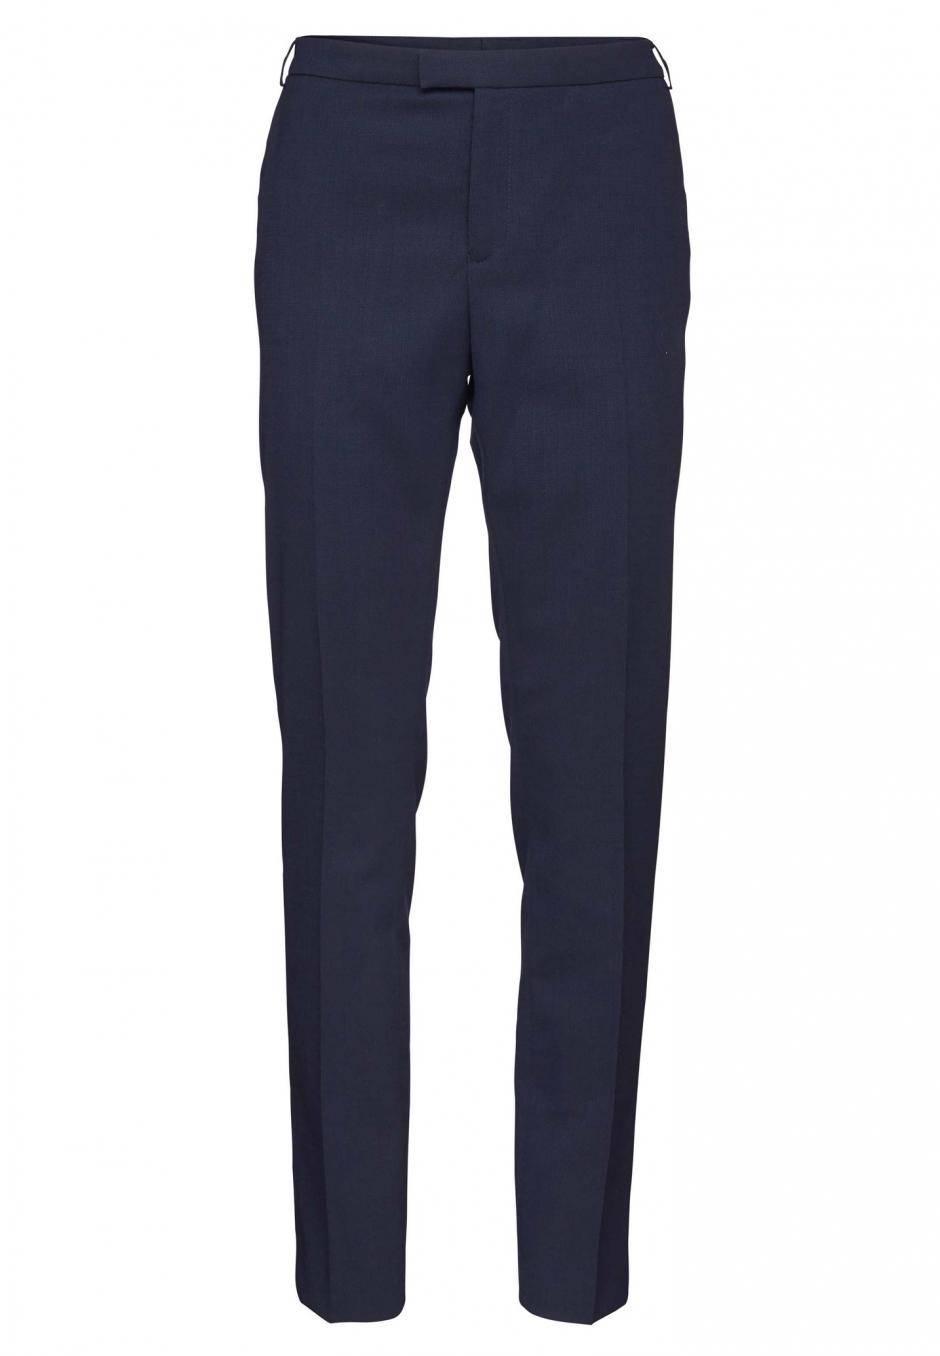 Tiger of Sweden Lovann 5 Trousers Blue